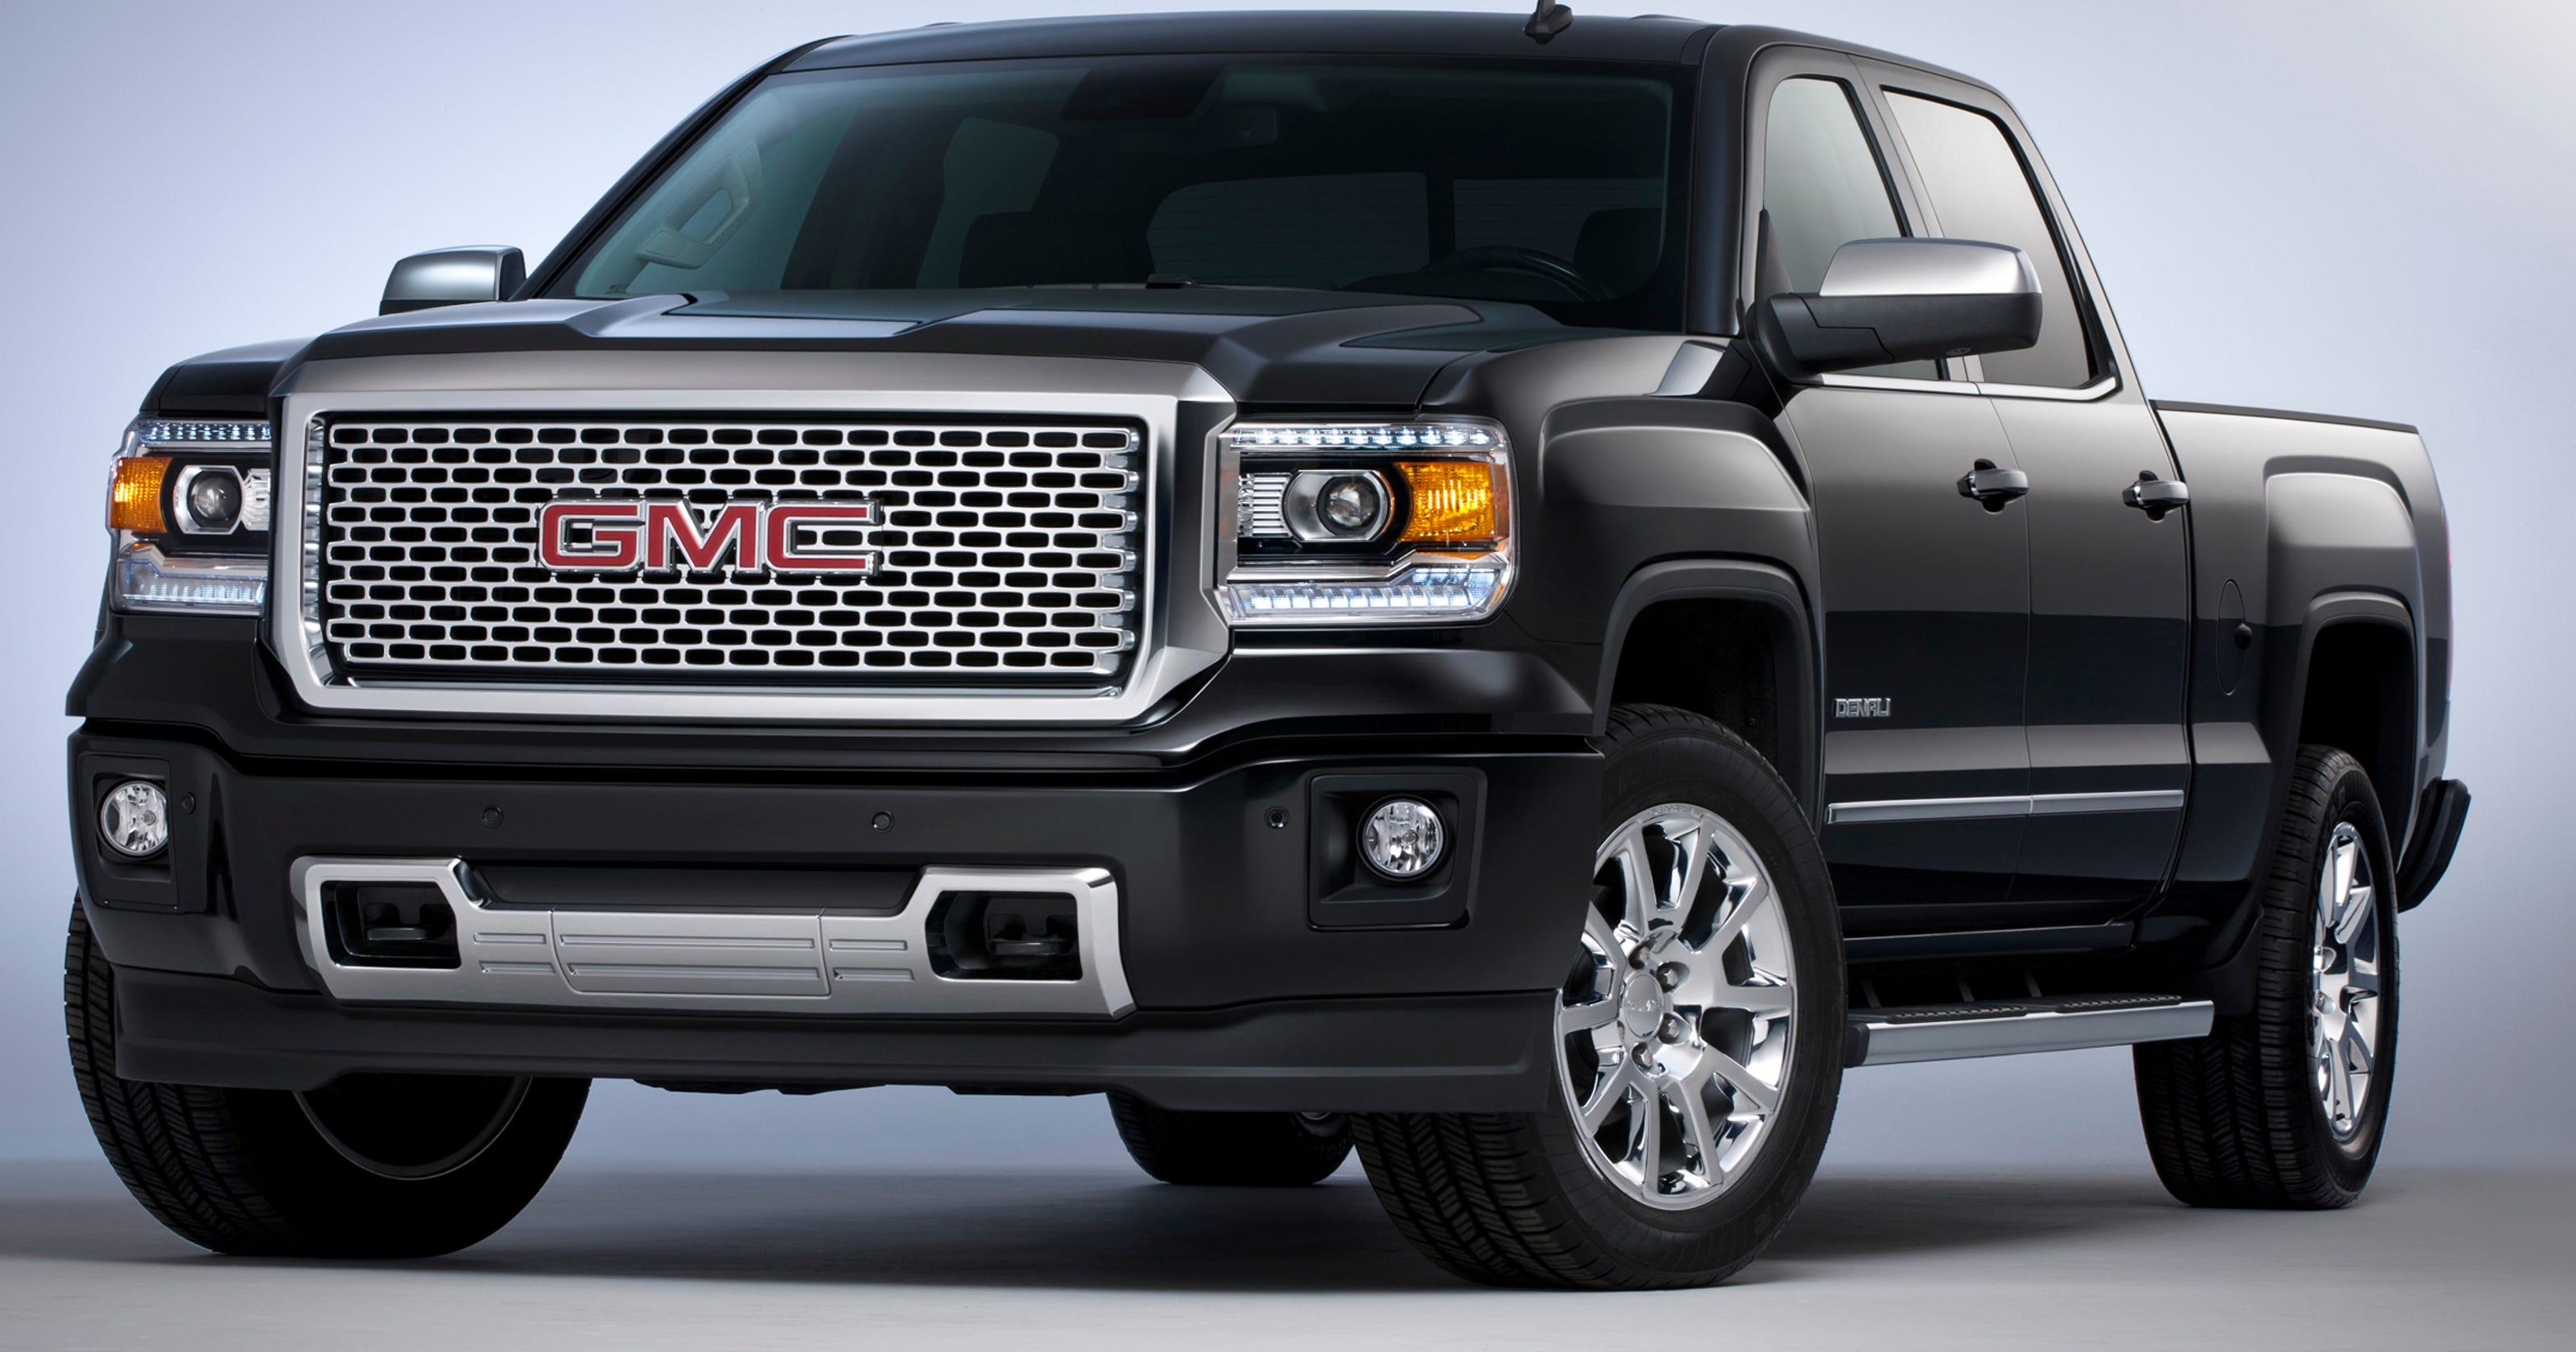 gm recalls 4 3m vehicles to fix air bag software. Black Bedroom Furniture Sets. Home Design Ideas